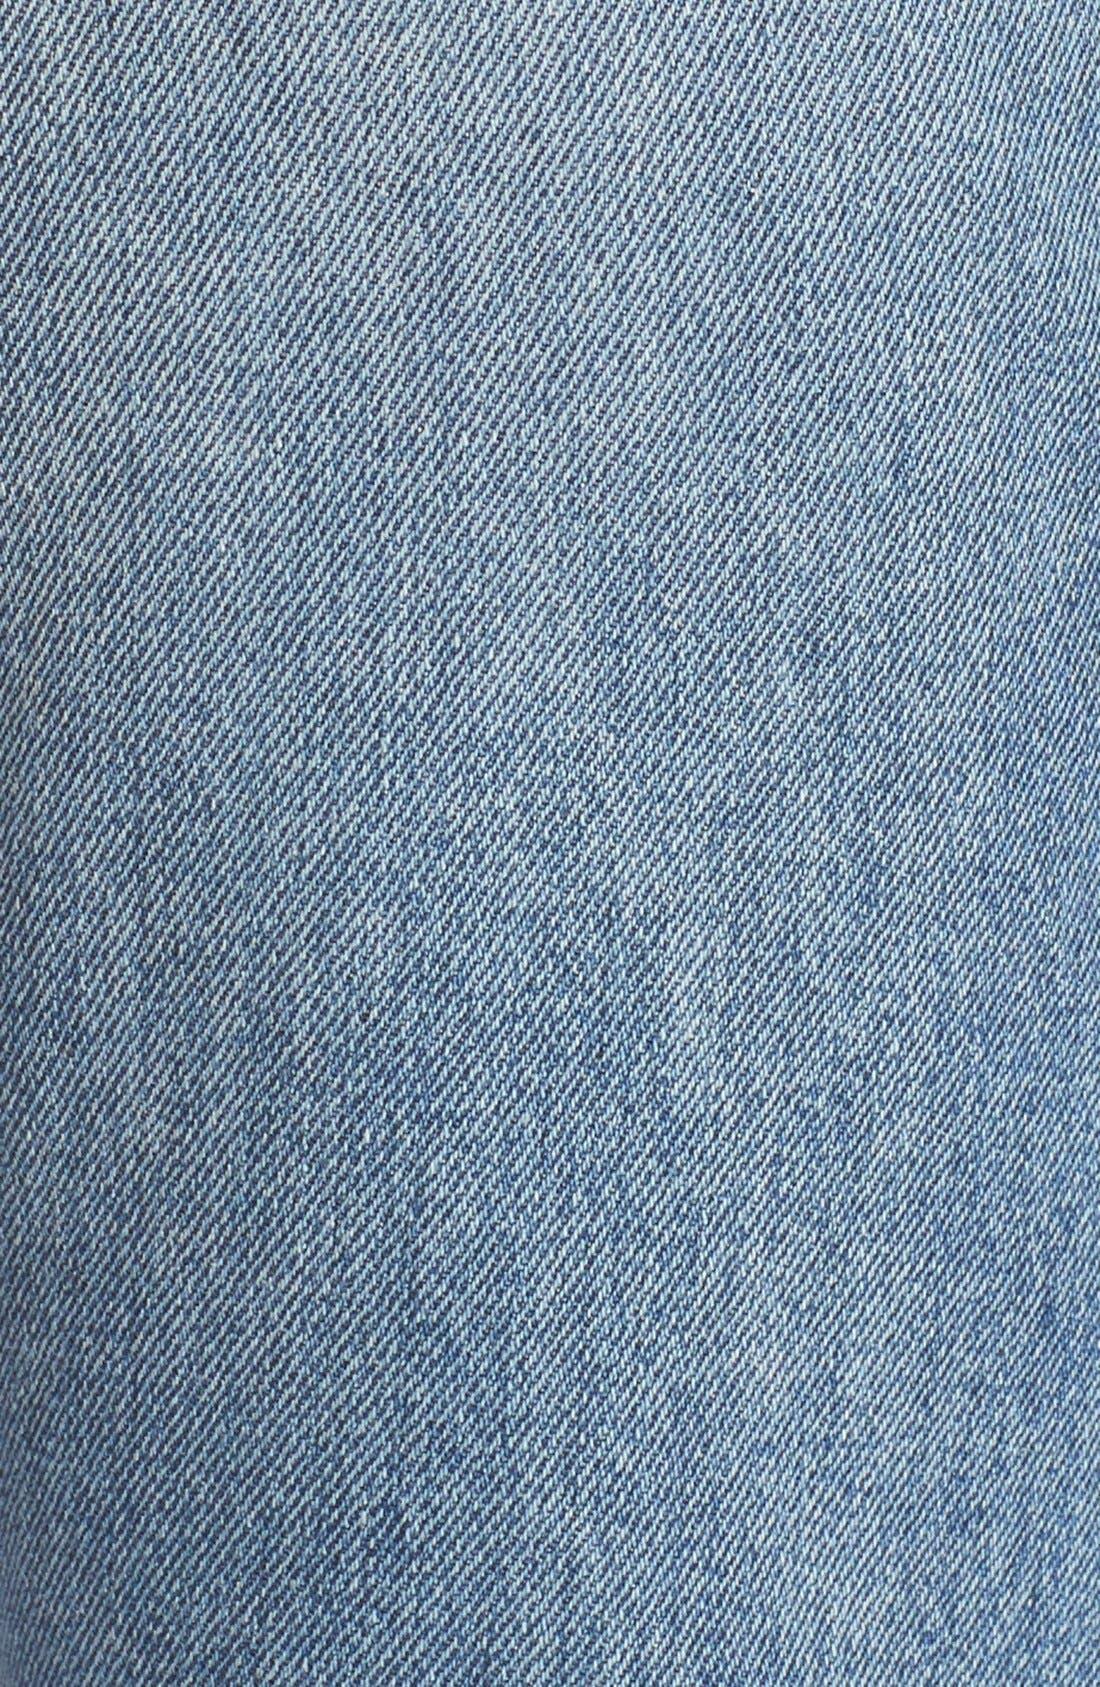 Alternate Image 5  - Vince Vintage Straight Leg Crop Jeans (Calico)